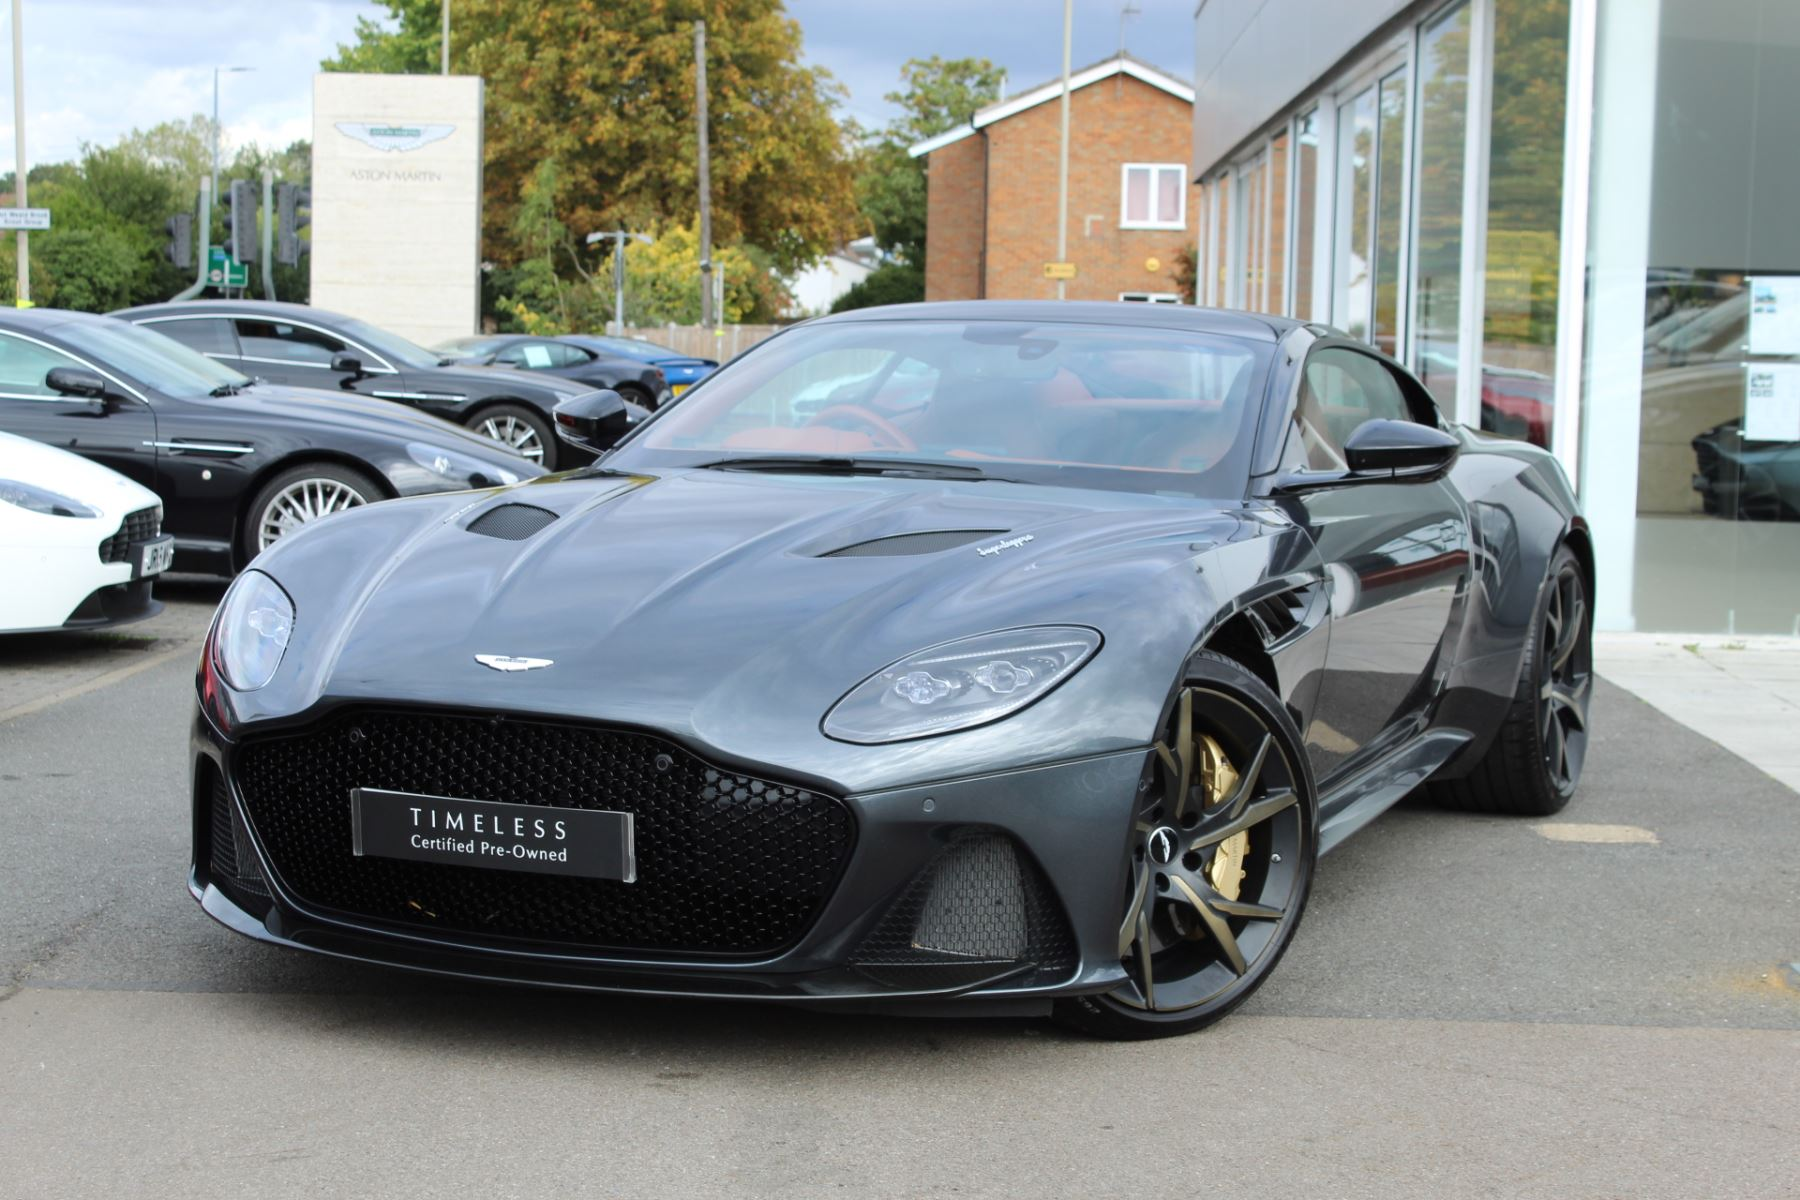 Aston Martin DBS V12 Superleggera 2dr Touchtronic image 3